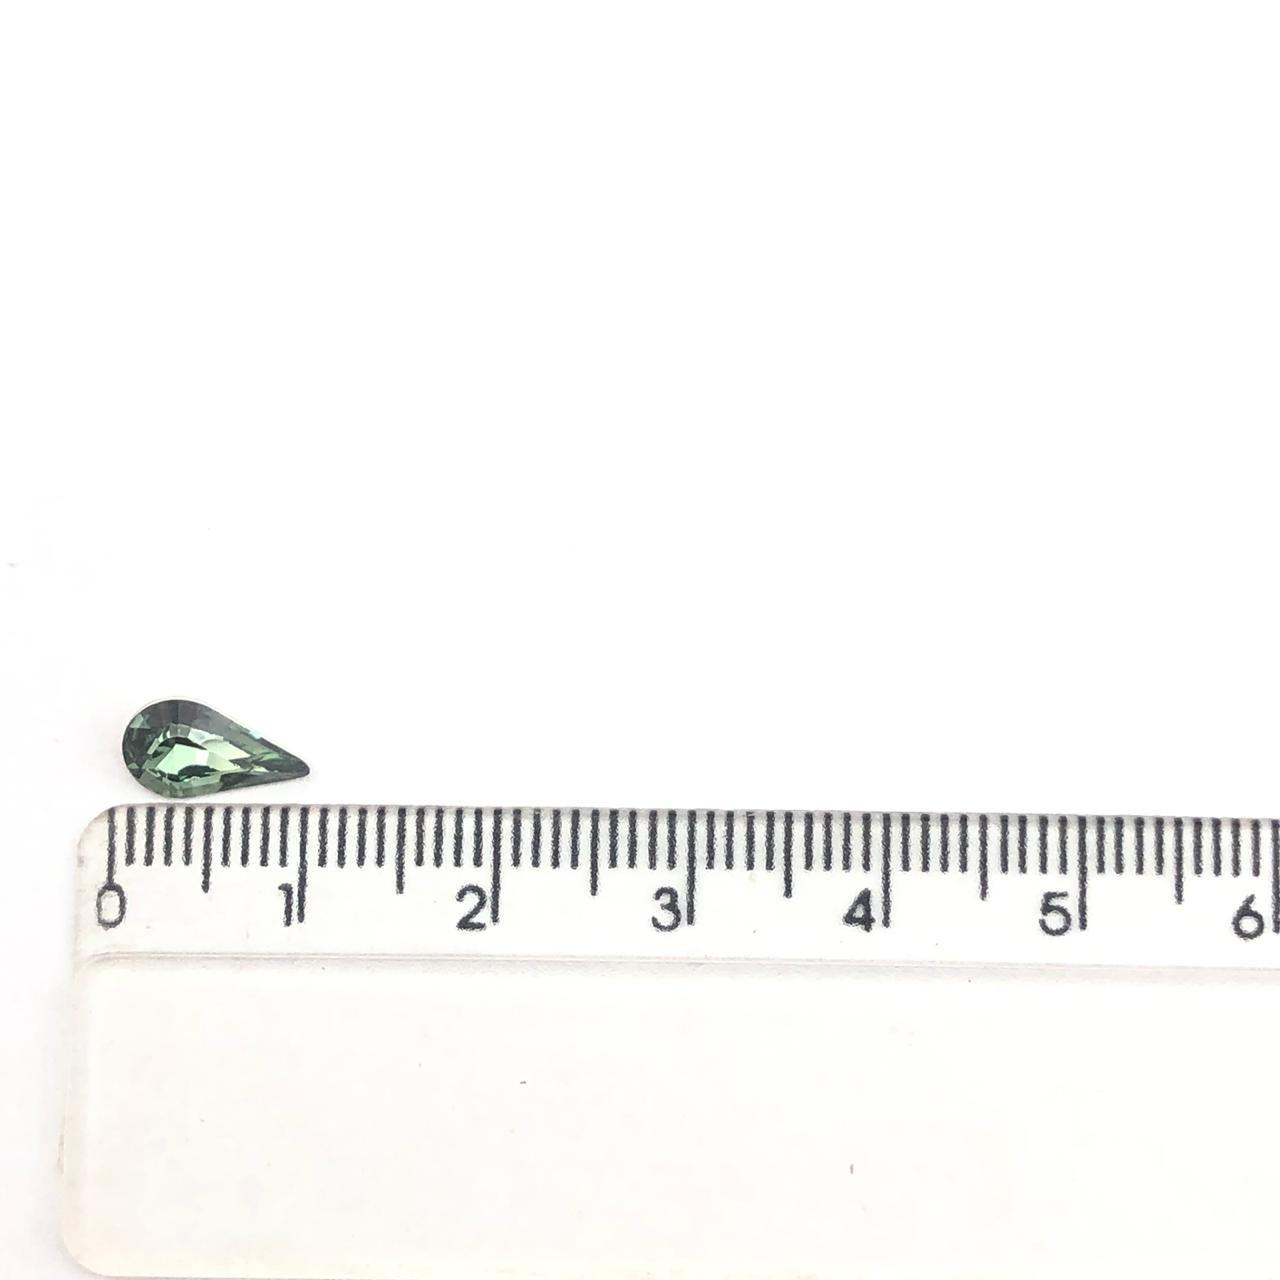 CHT1325  - Chaton Gota Base Côncava Green Turmaline 6x10 - 10unids